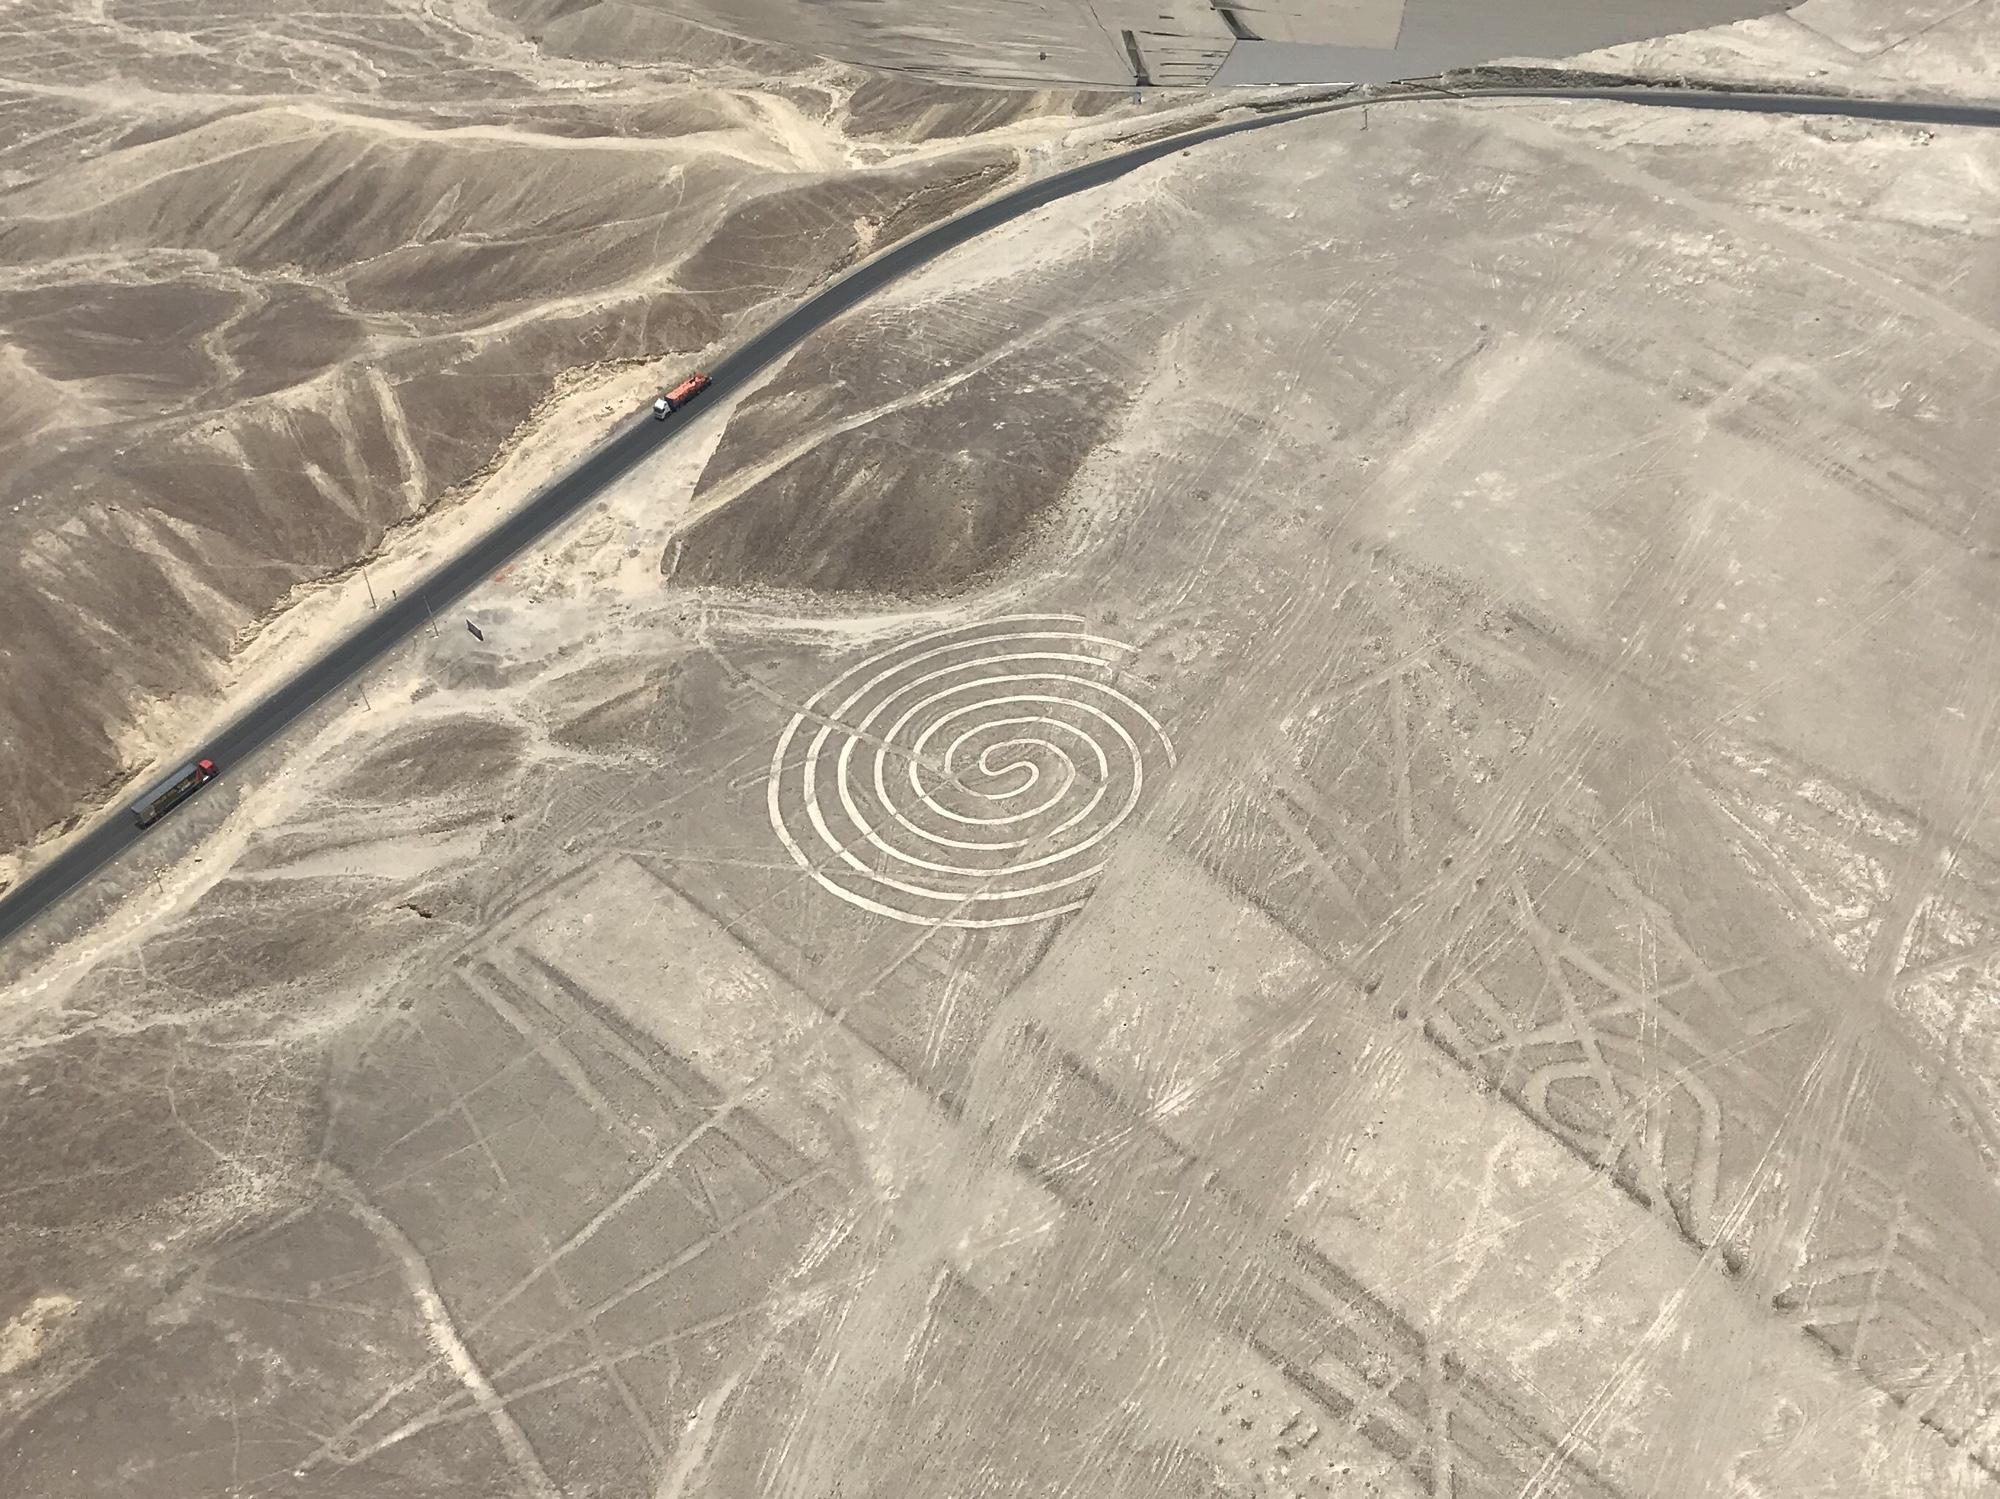 Affentanz - Rundflug Nazca